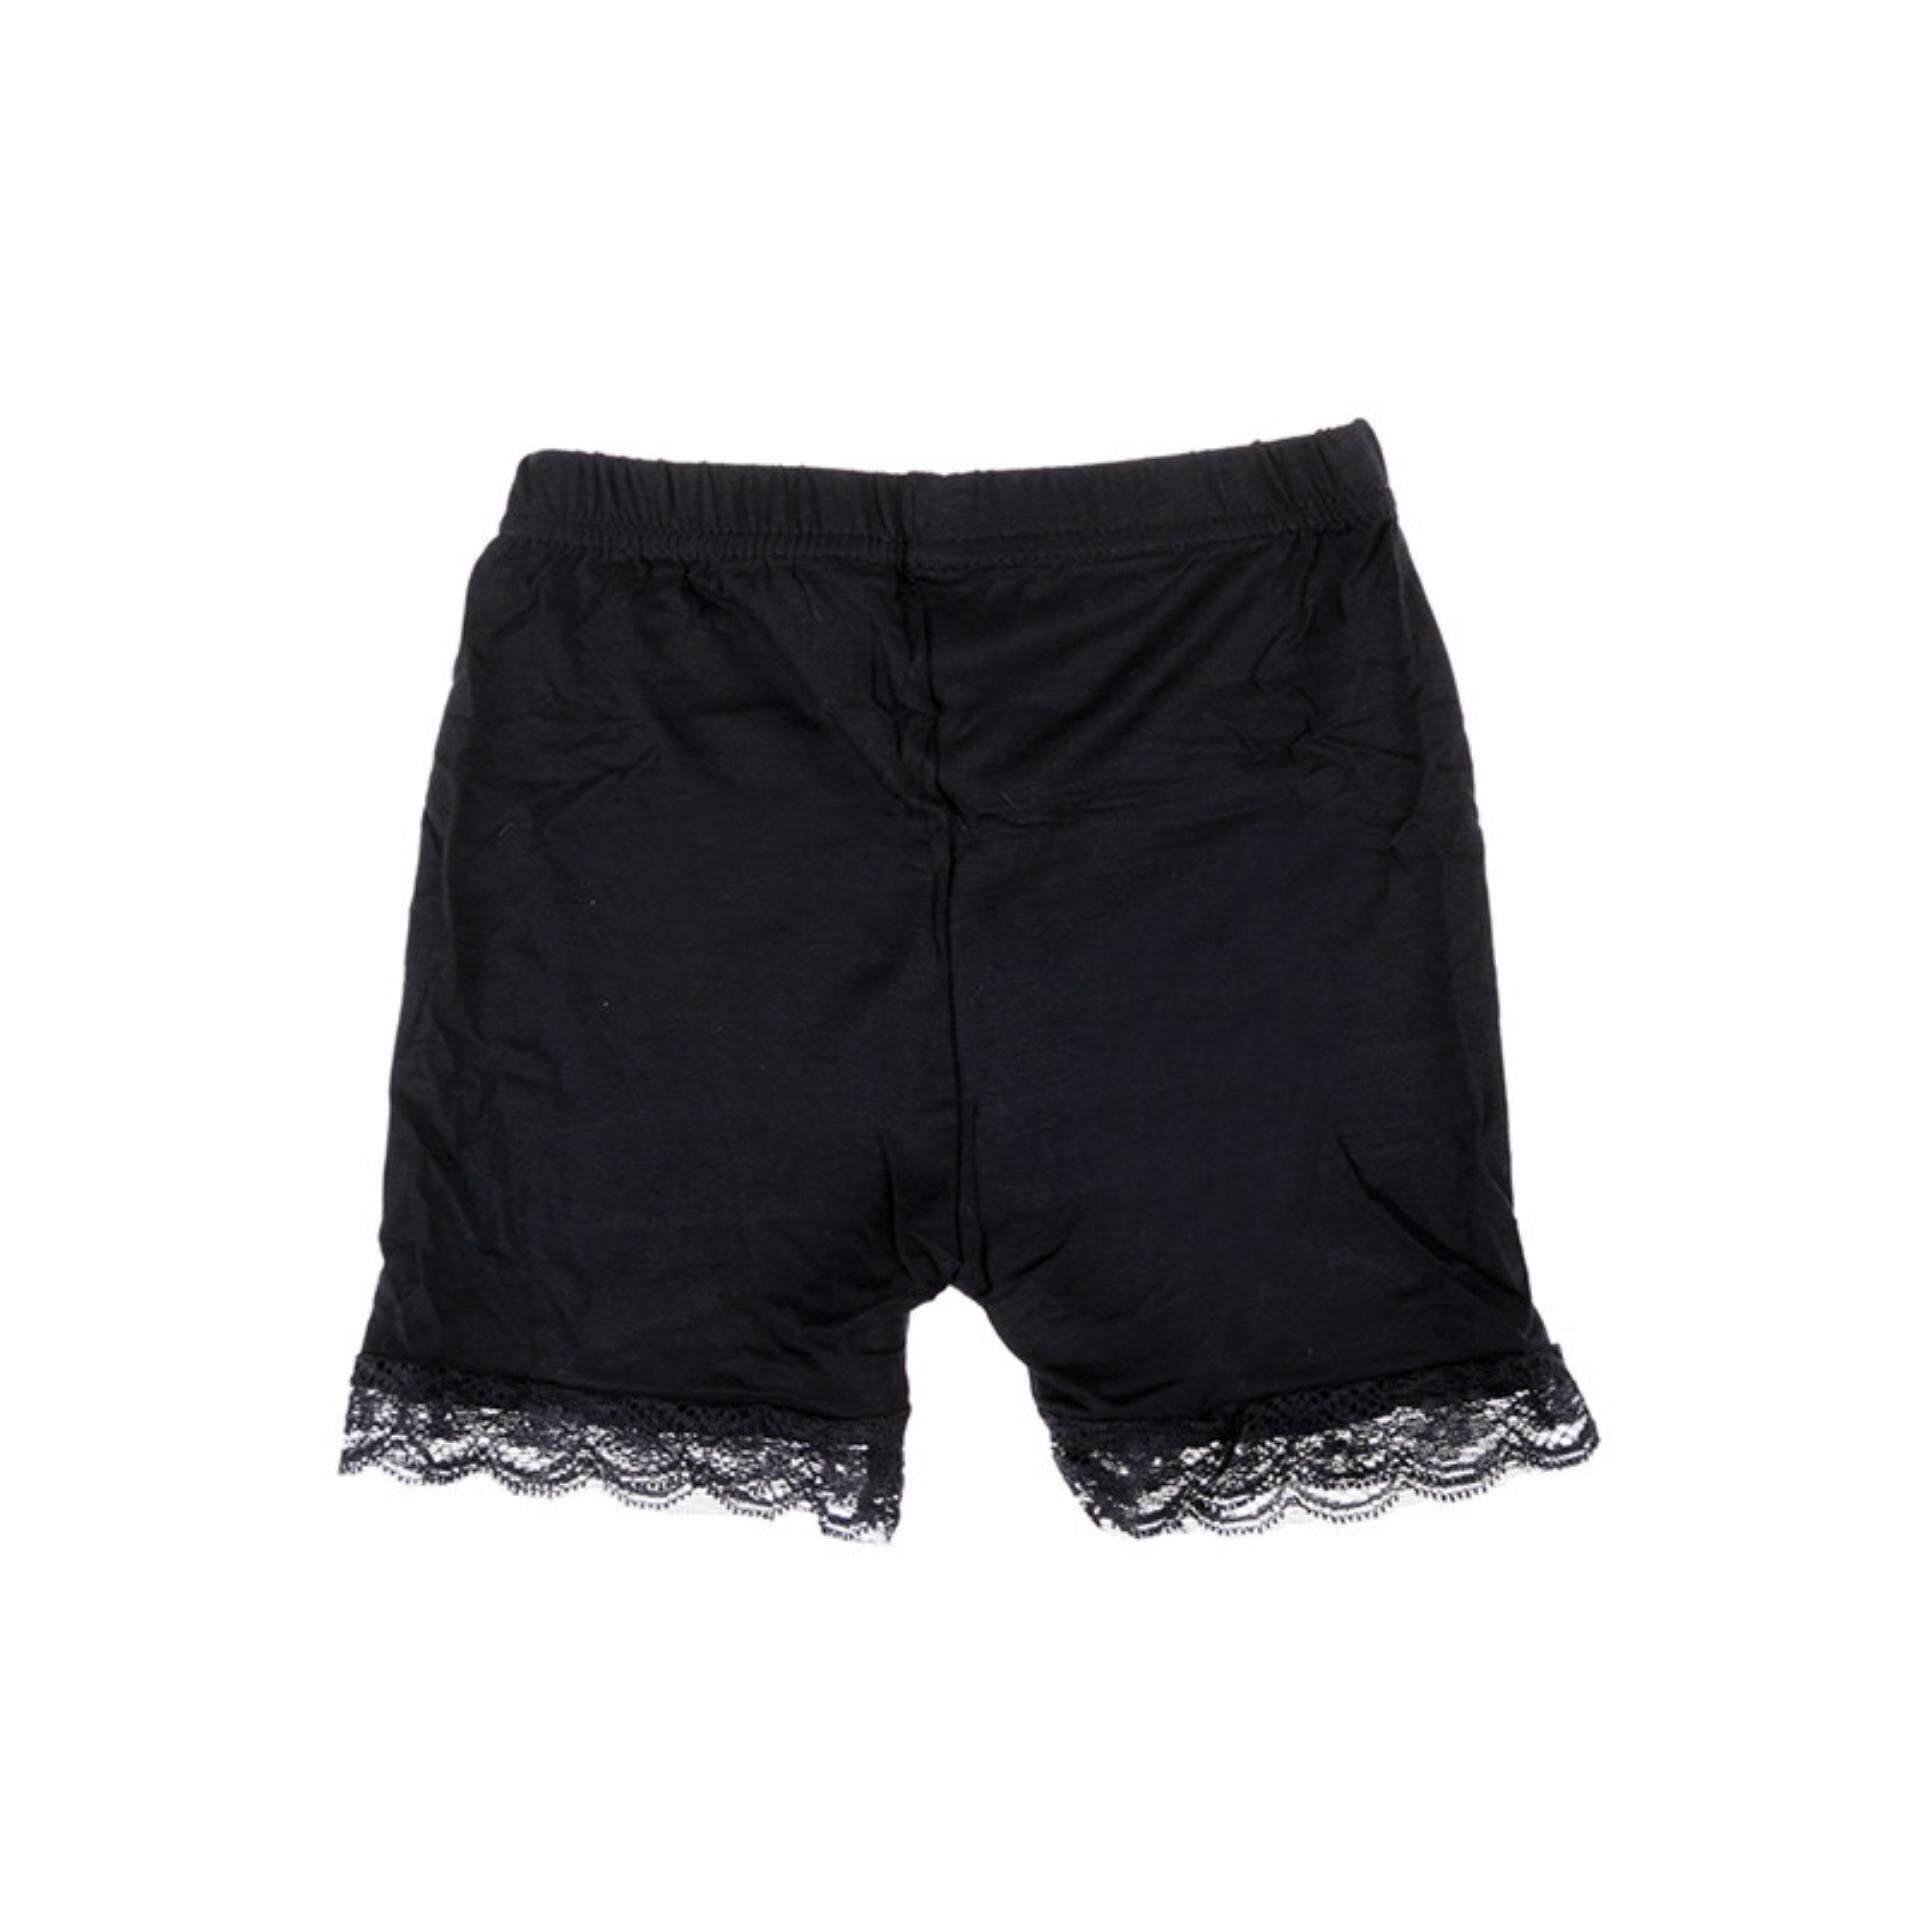 Buy Sell Cheapest 11cm Anti Best Quality Product Deals Celana Pendek Anak Perempuan Bayi Tiga Modal Berenda Aman Hitam